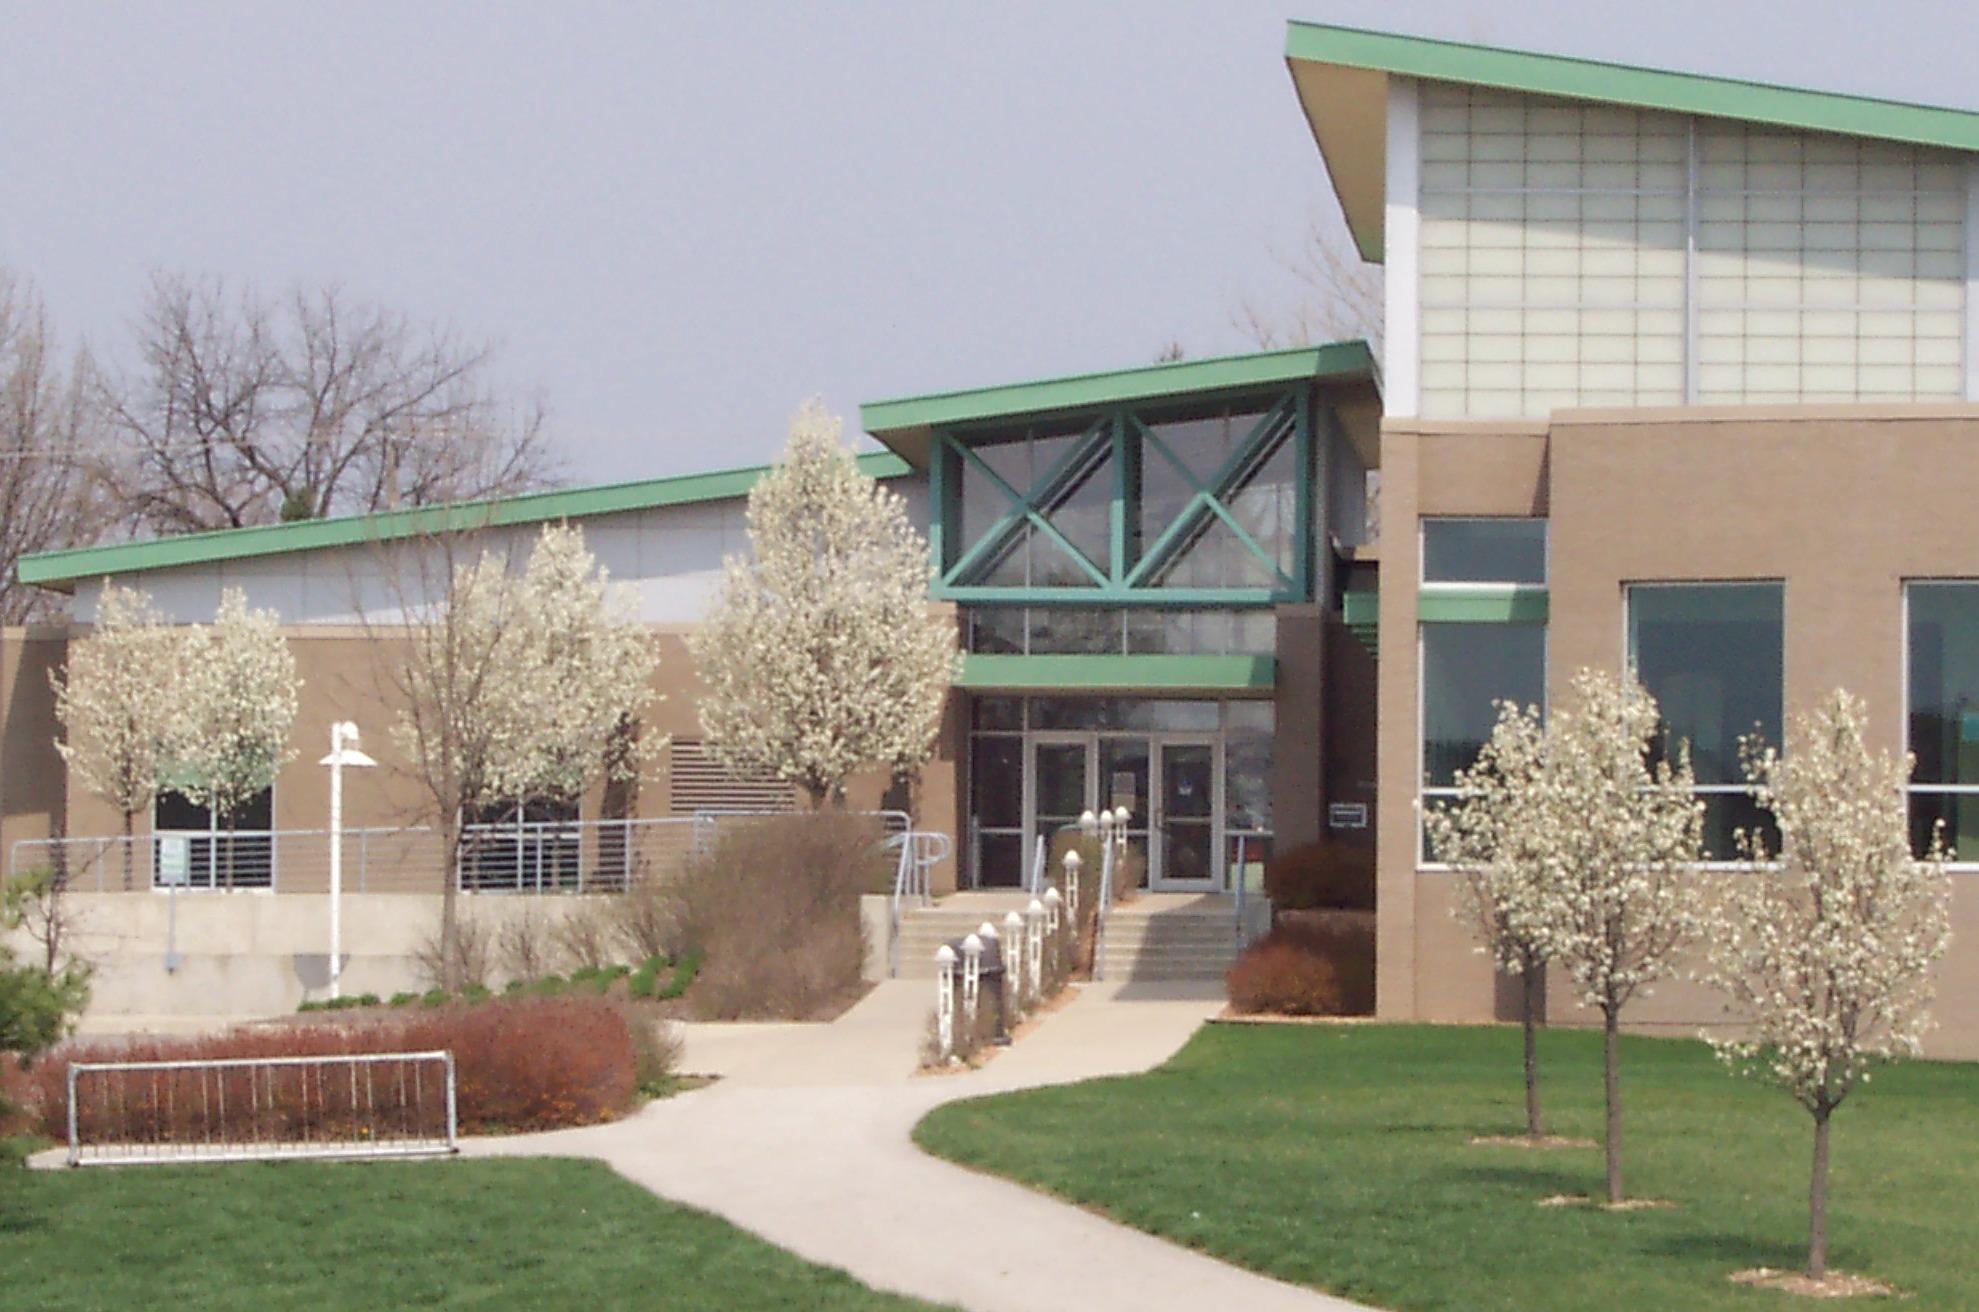 Altoona Public Library